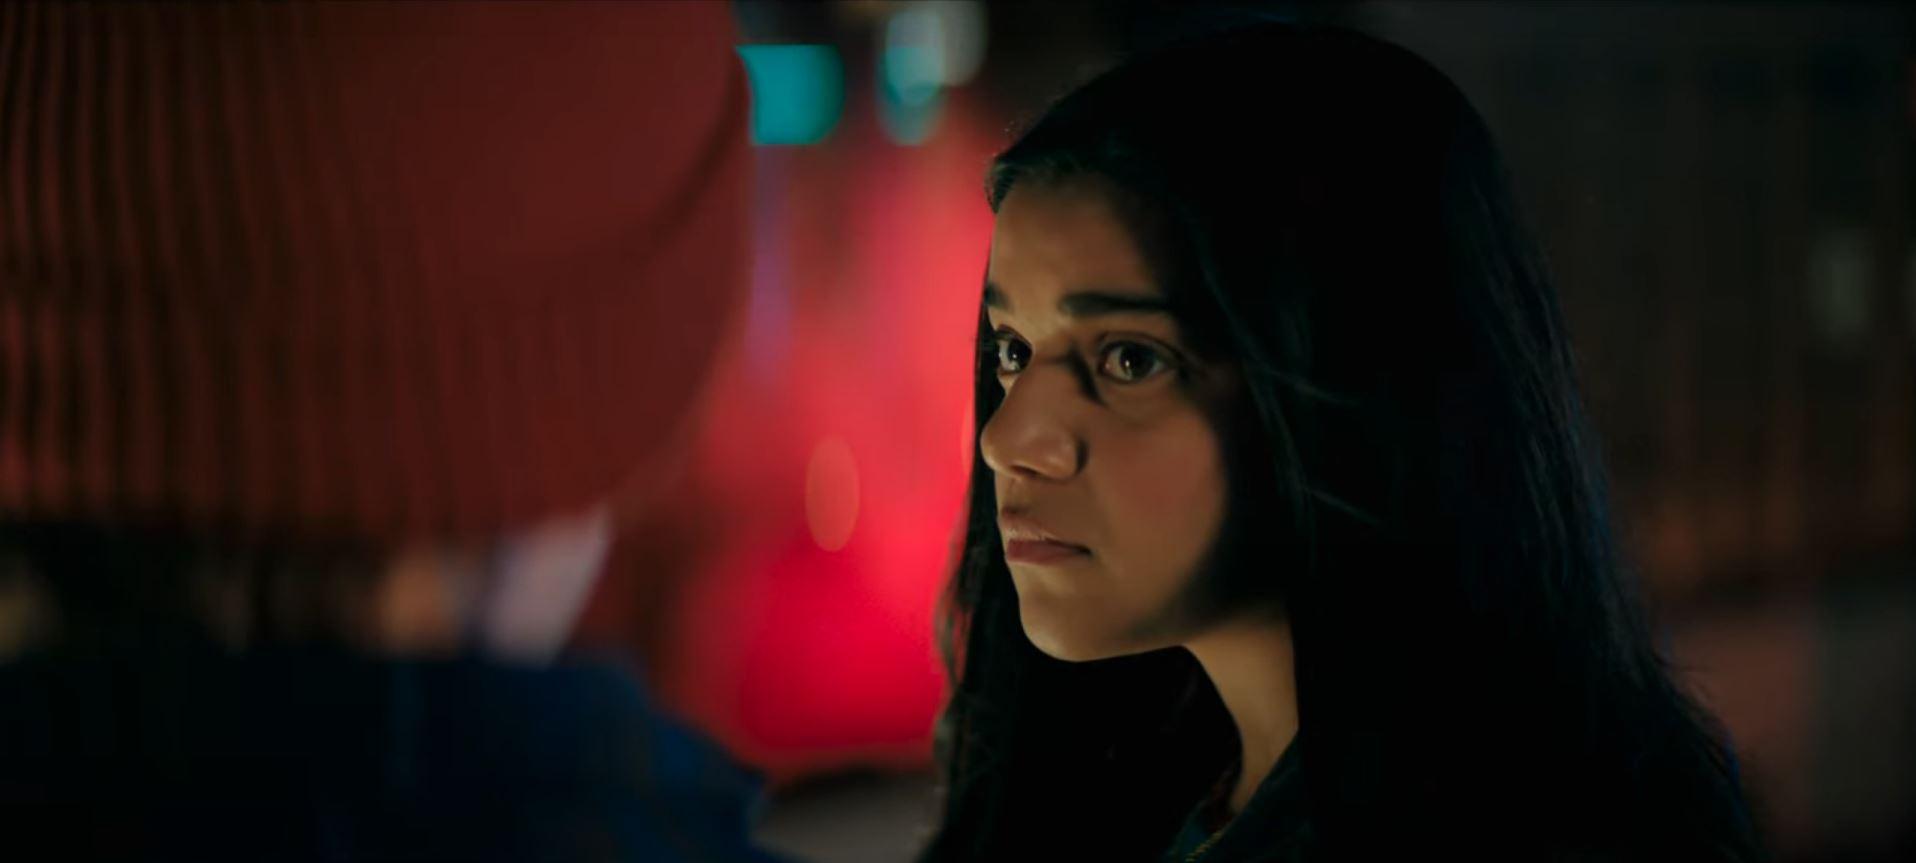 Iman Vellani as Ms. Marvel